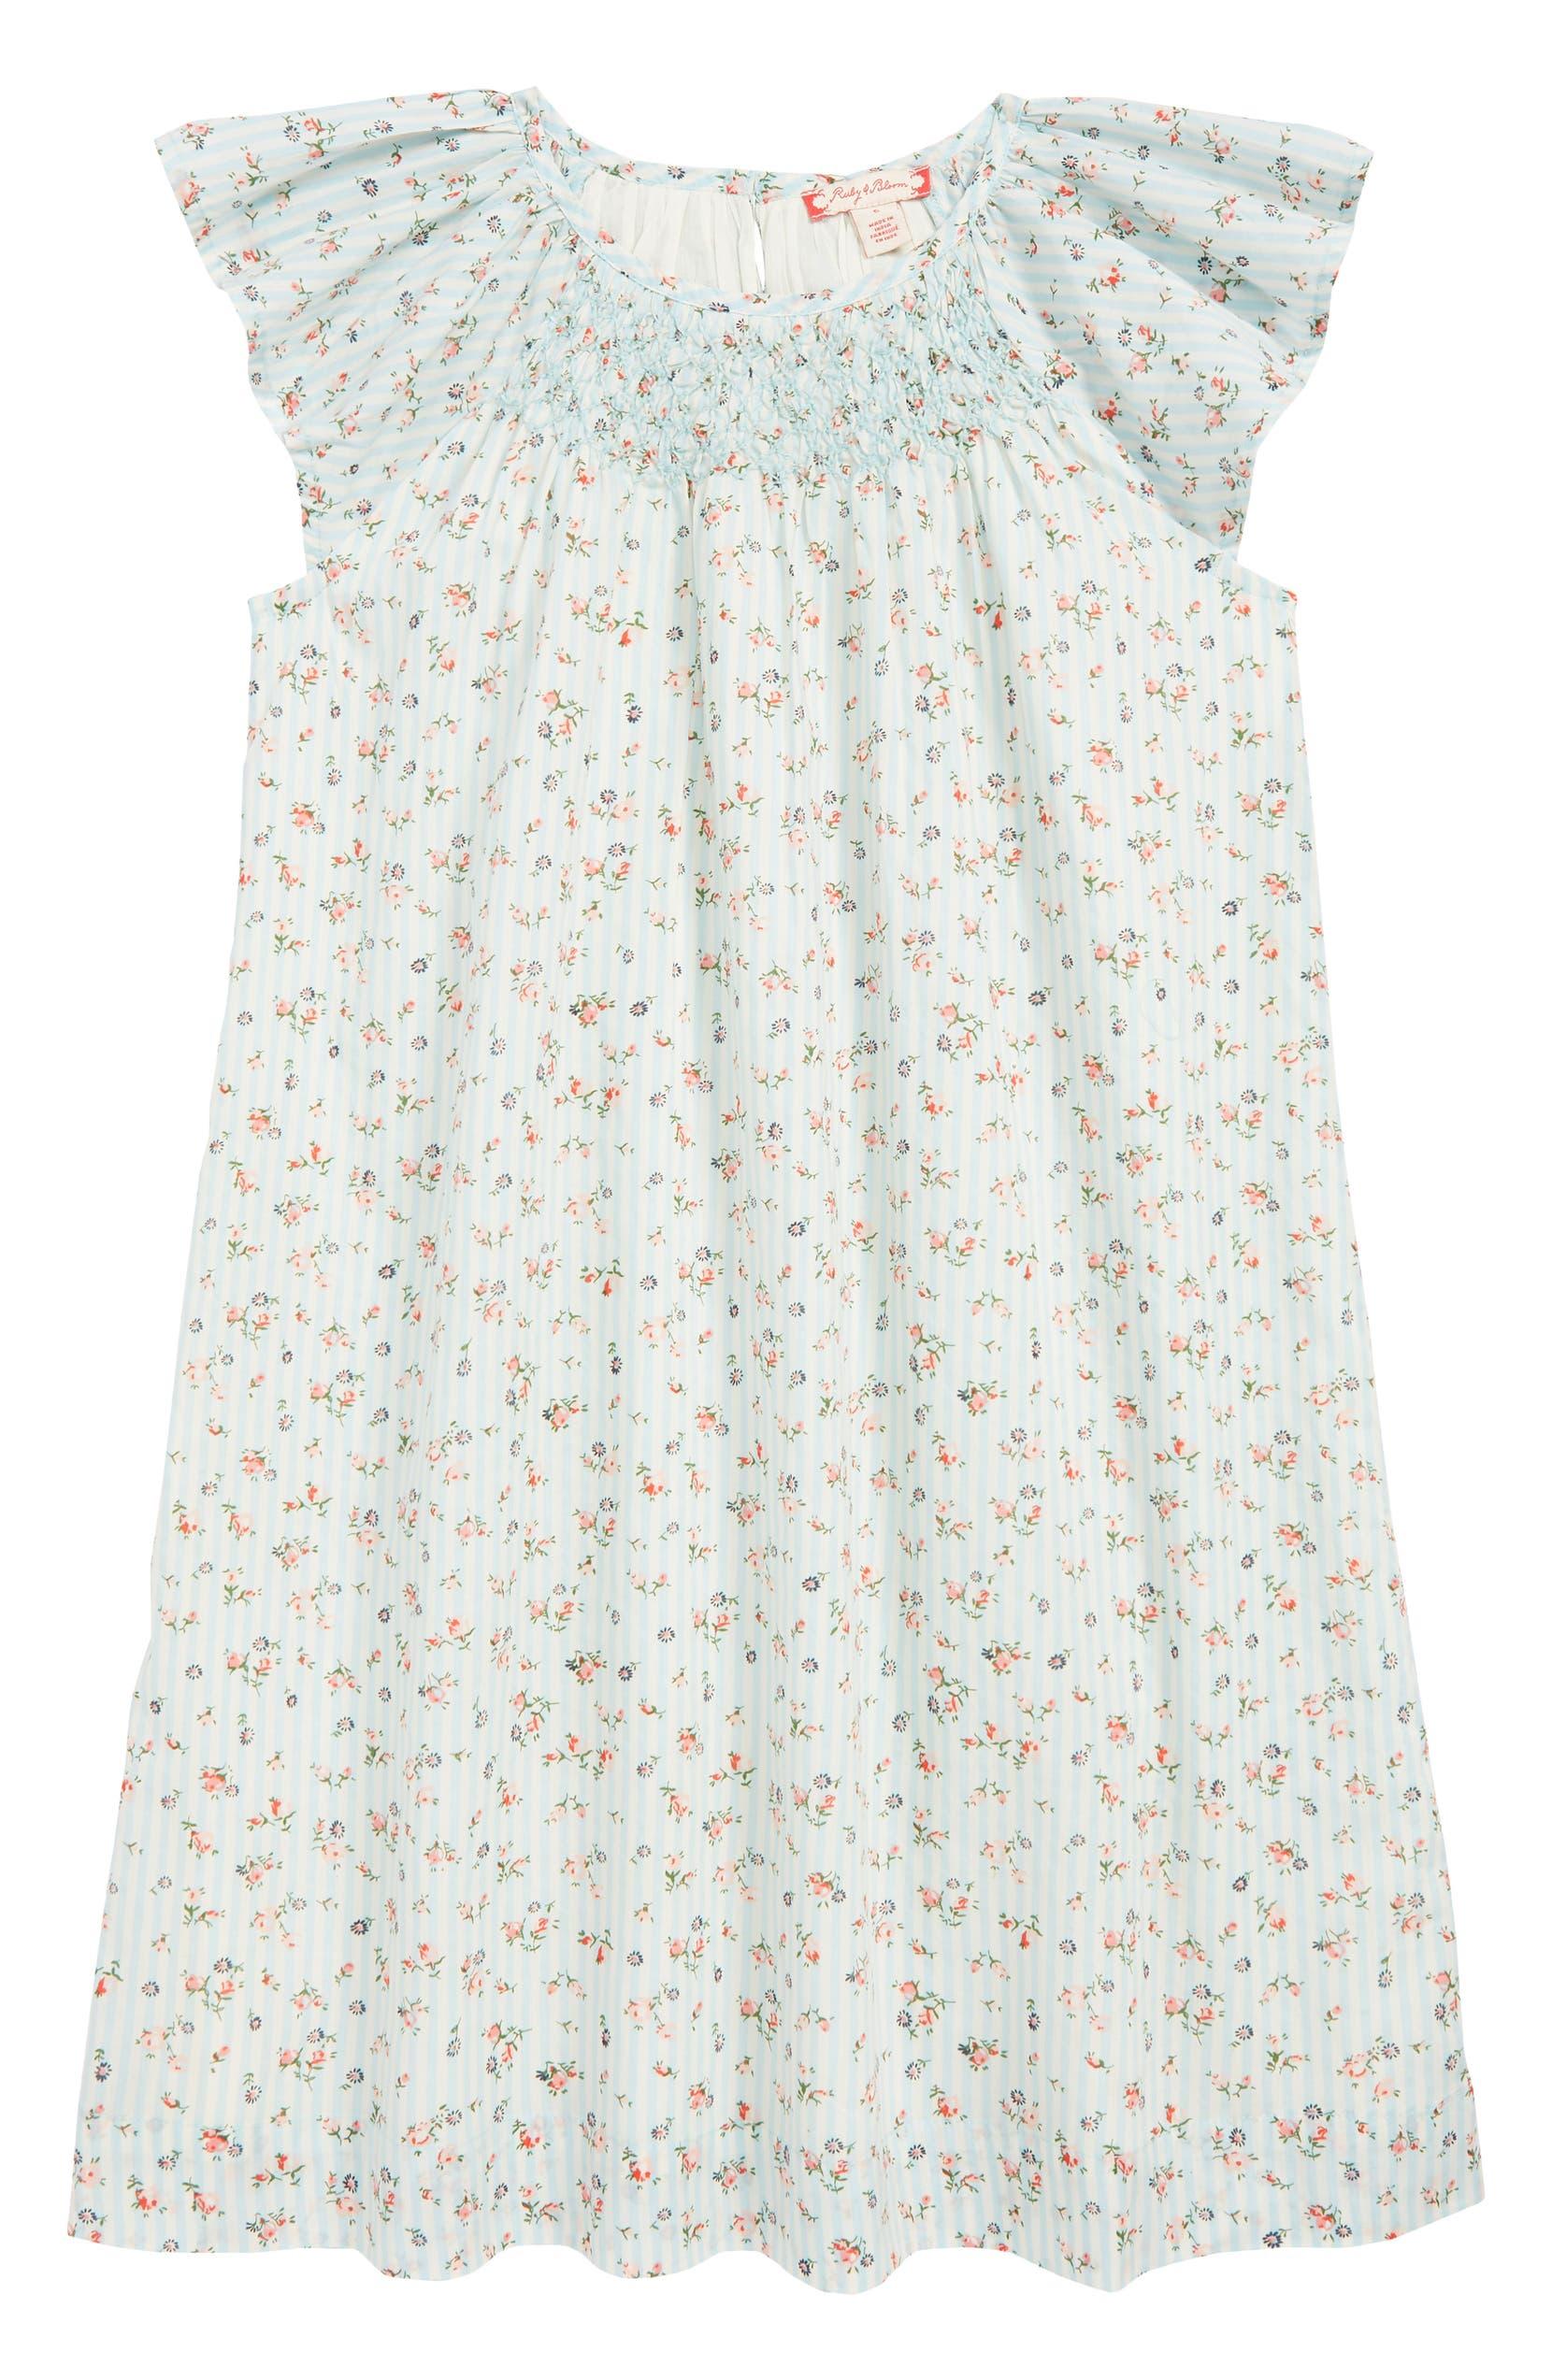 Ruby & Bloom Louisa Smocked Dress (Toddler Girls, Little